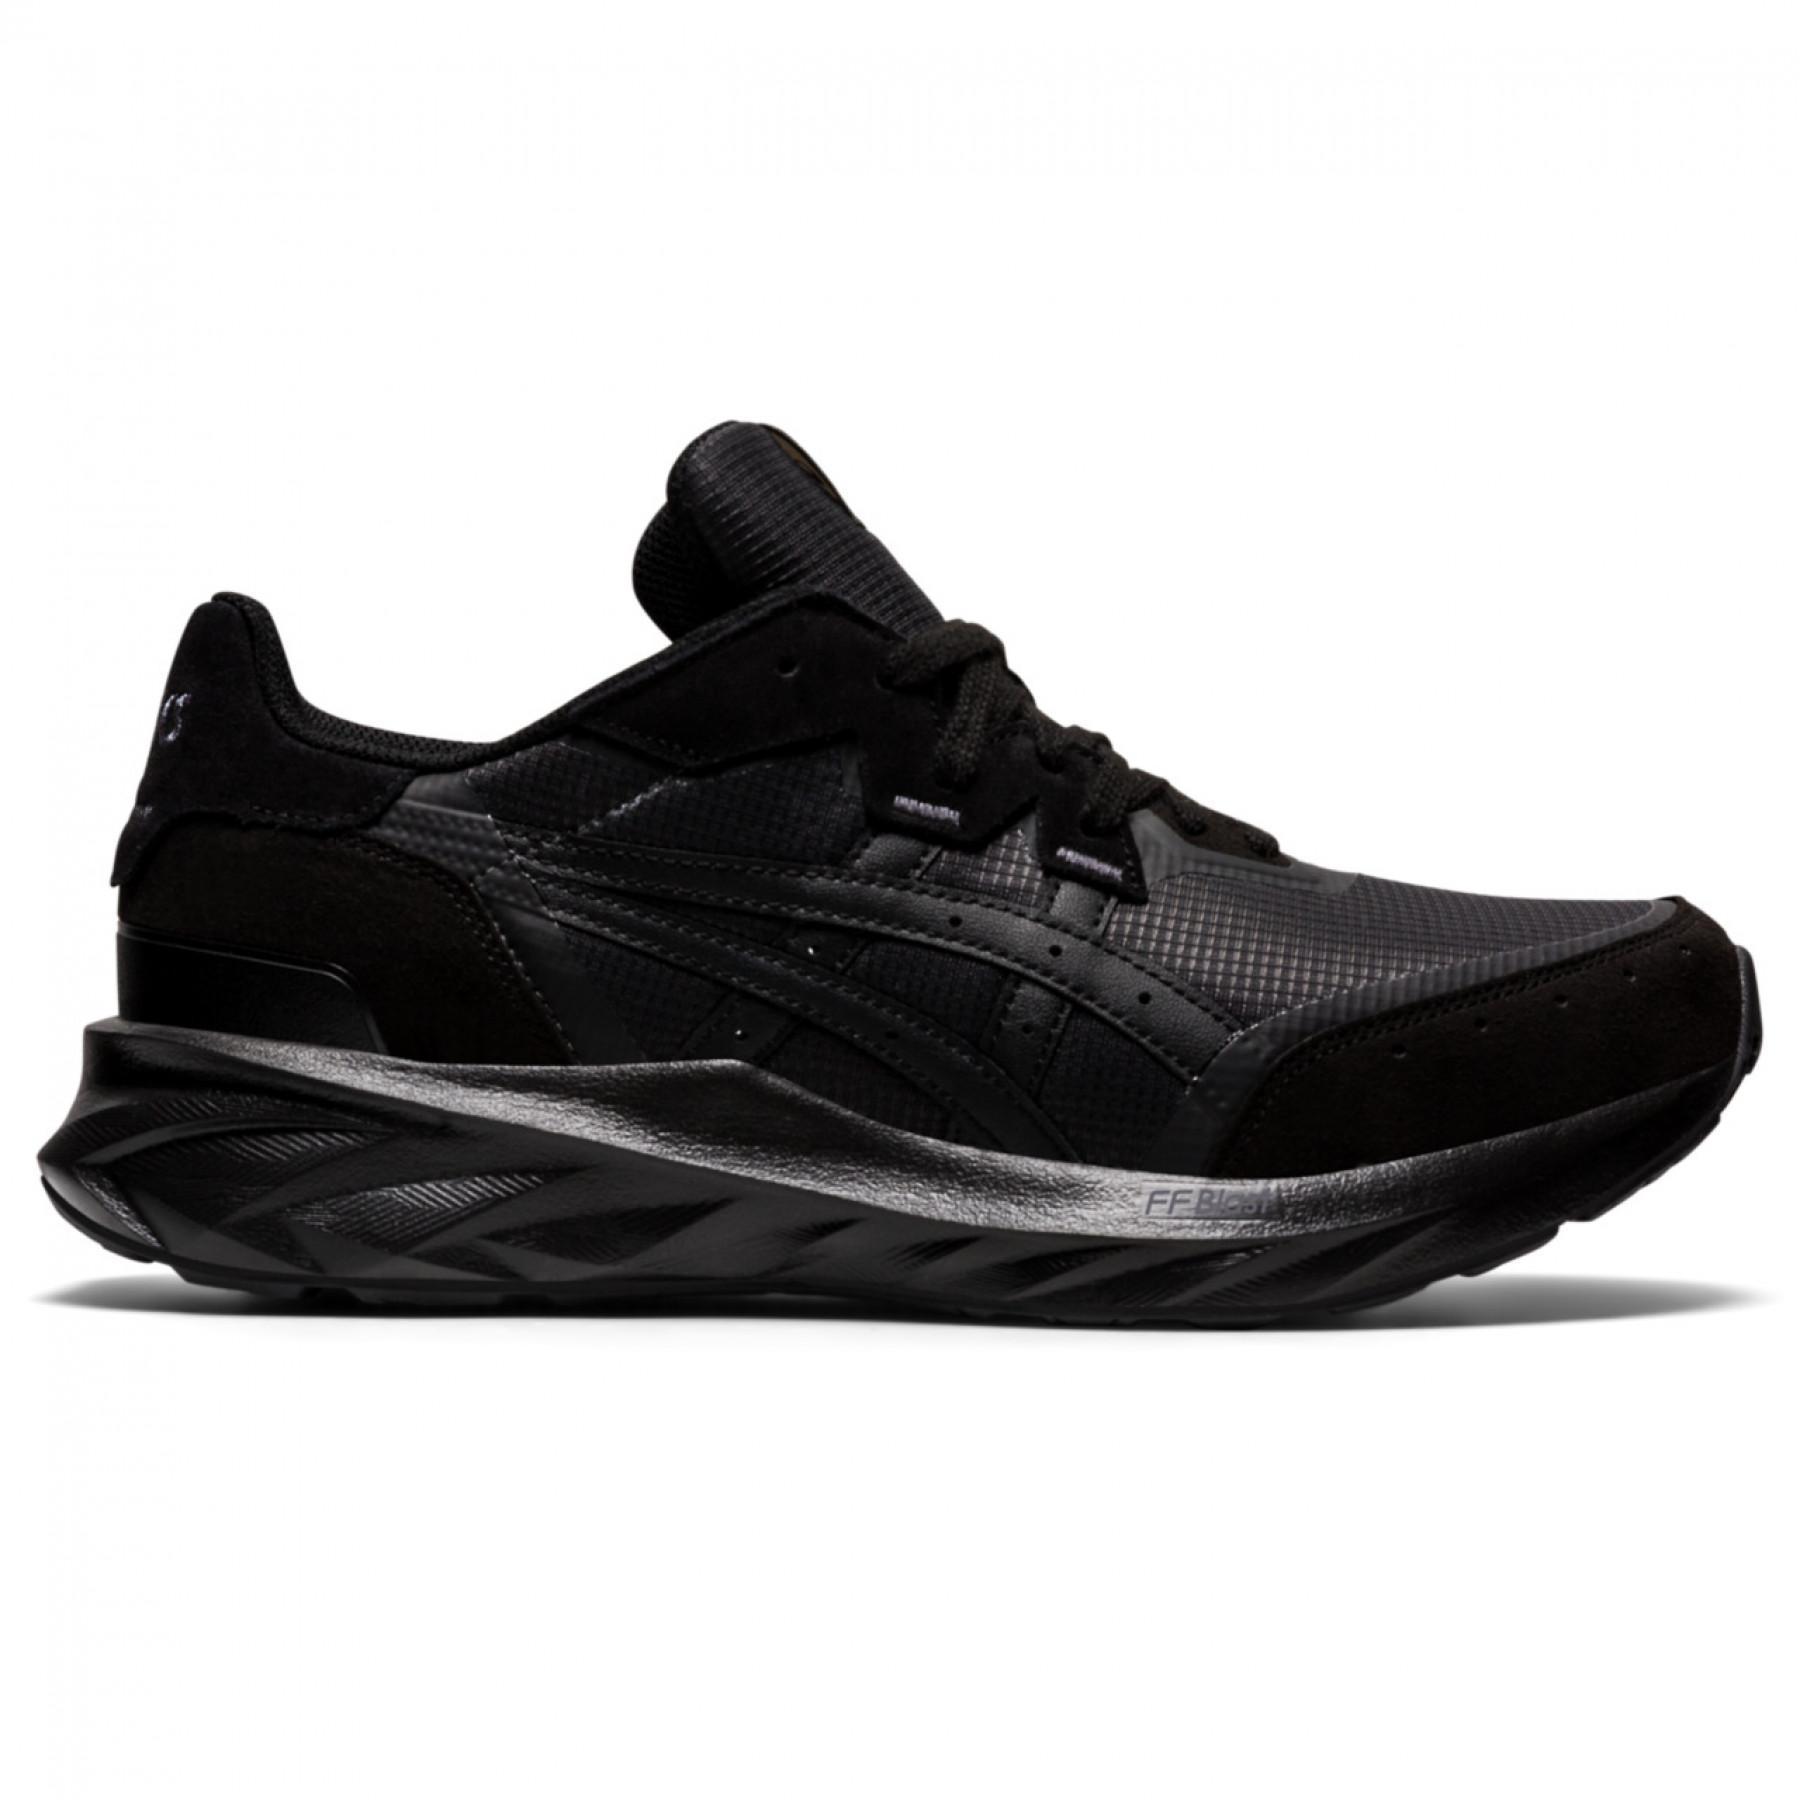 Asics Tarther Blast Sneakers